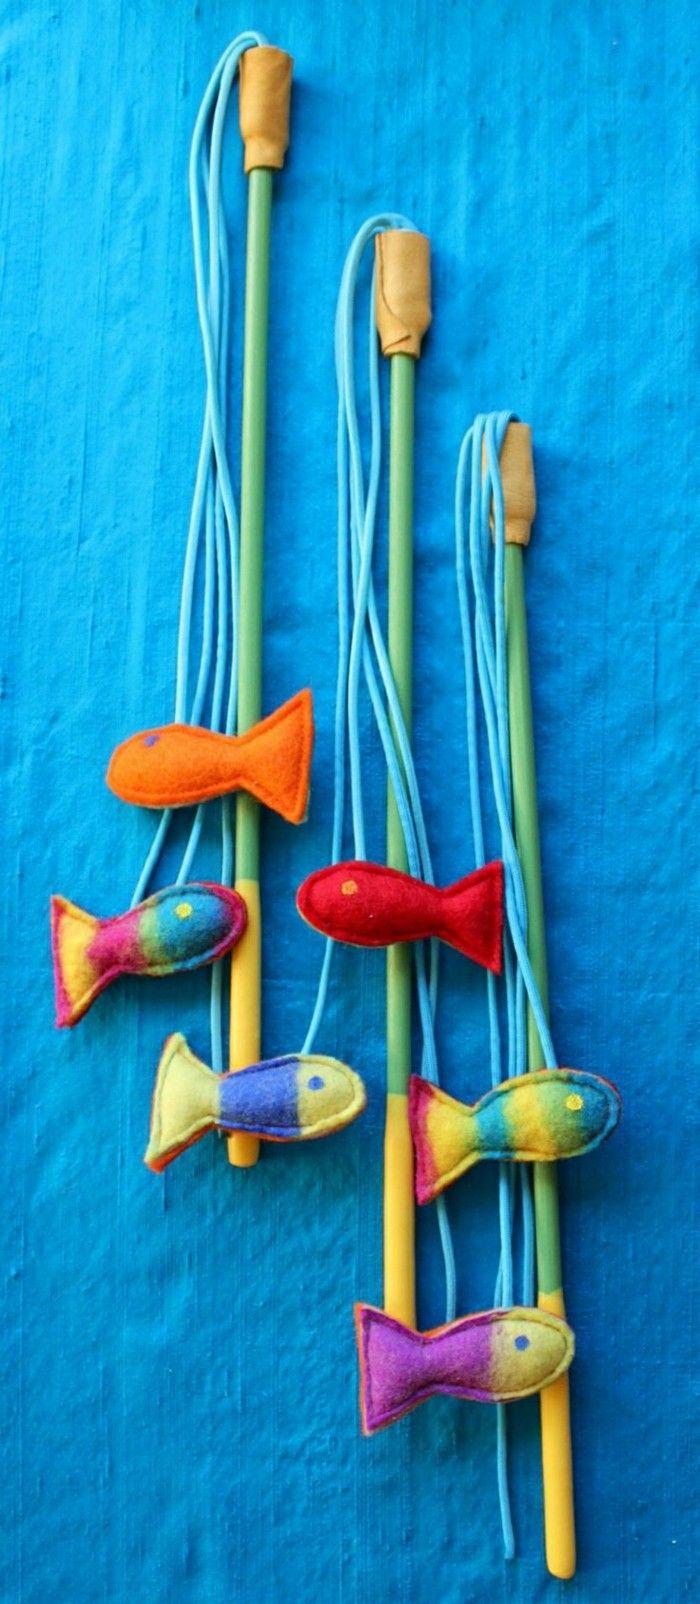 katzenspielzeug selber machen fische | Katzen | Pinterest | Crazy ...